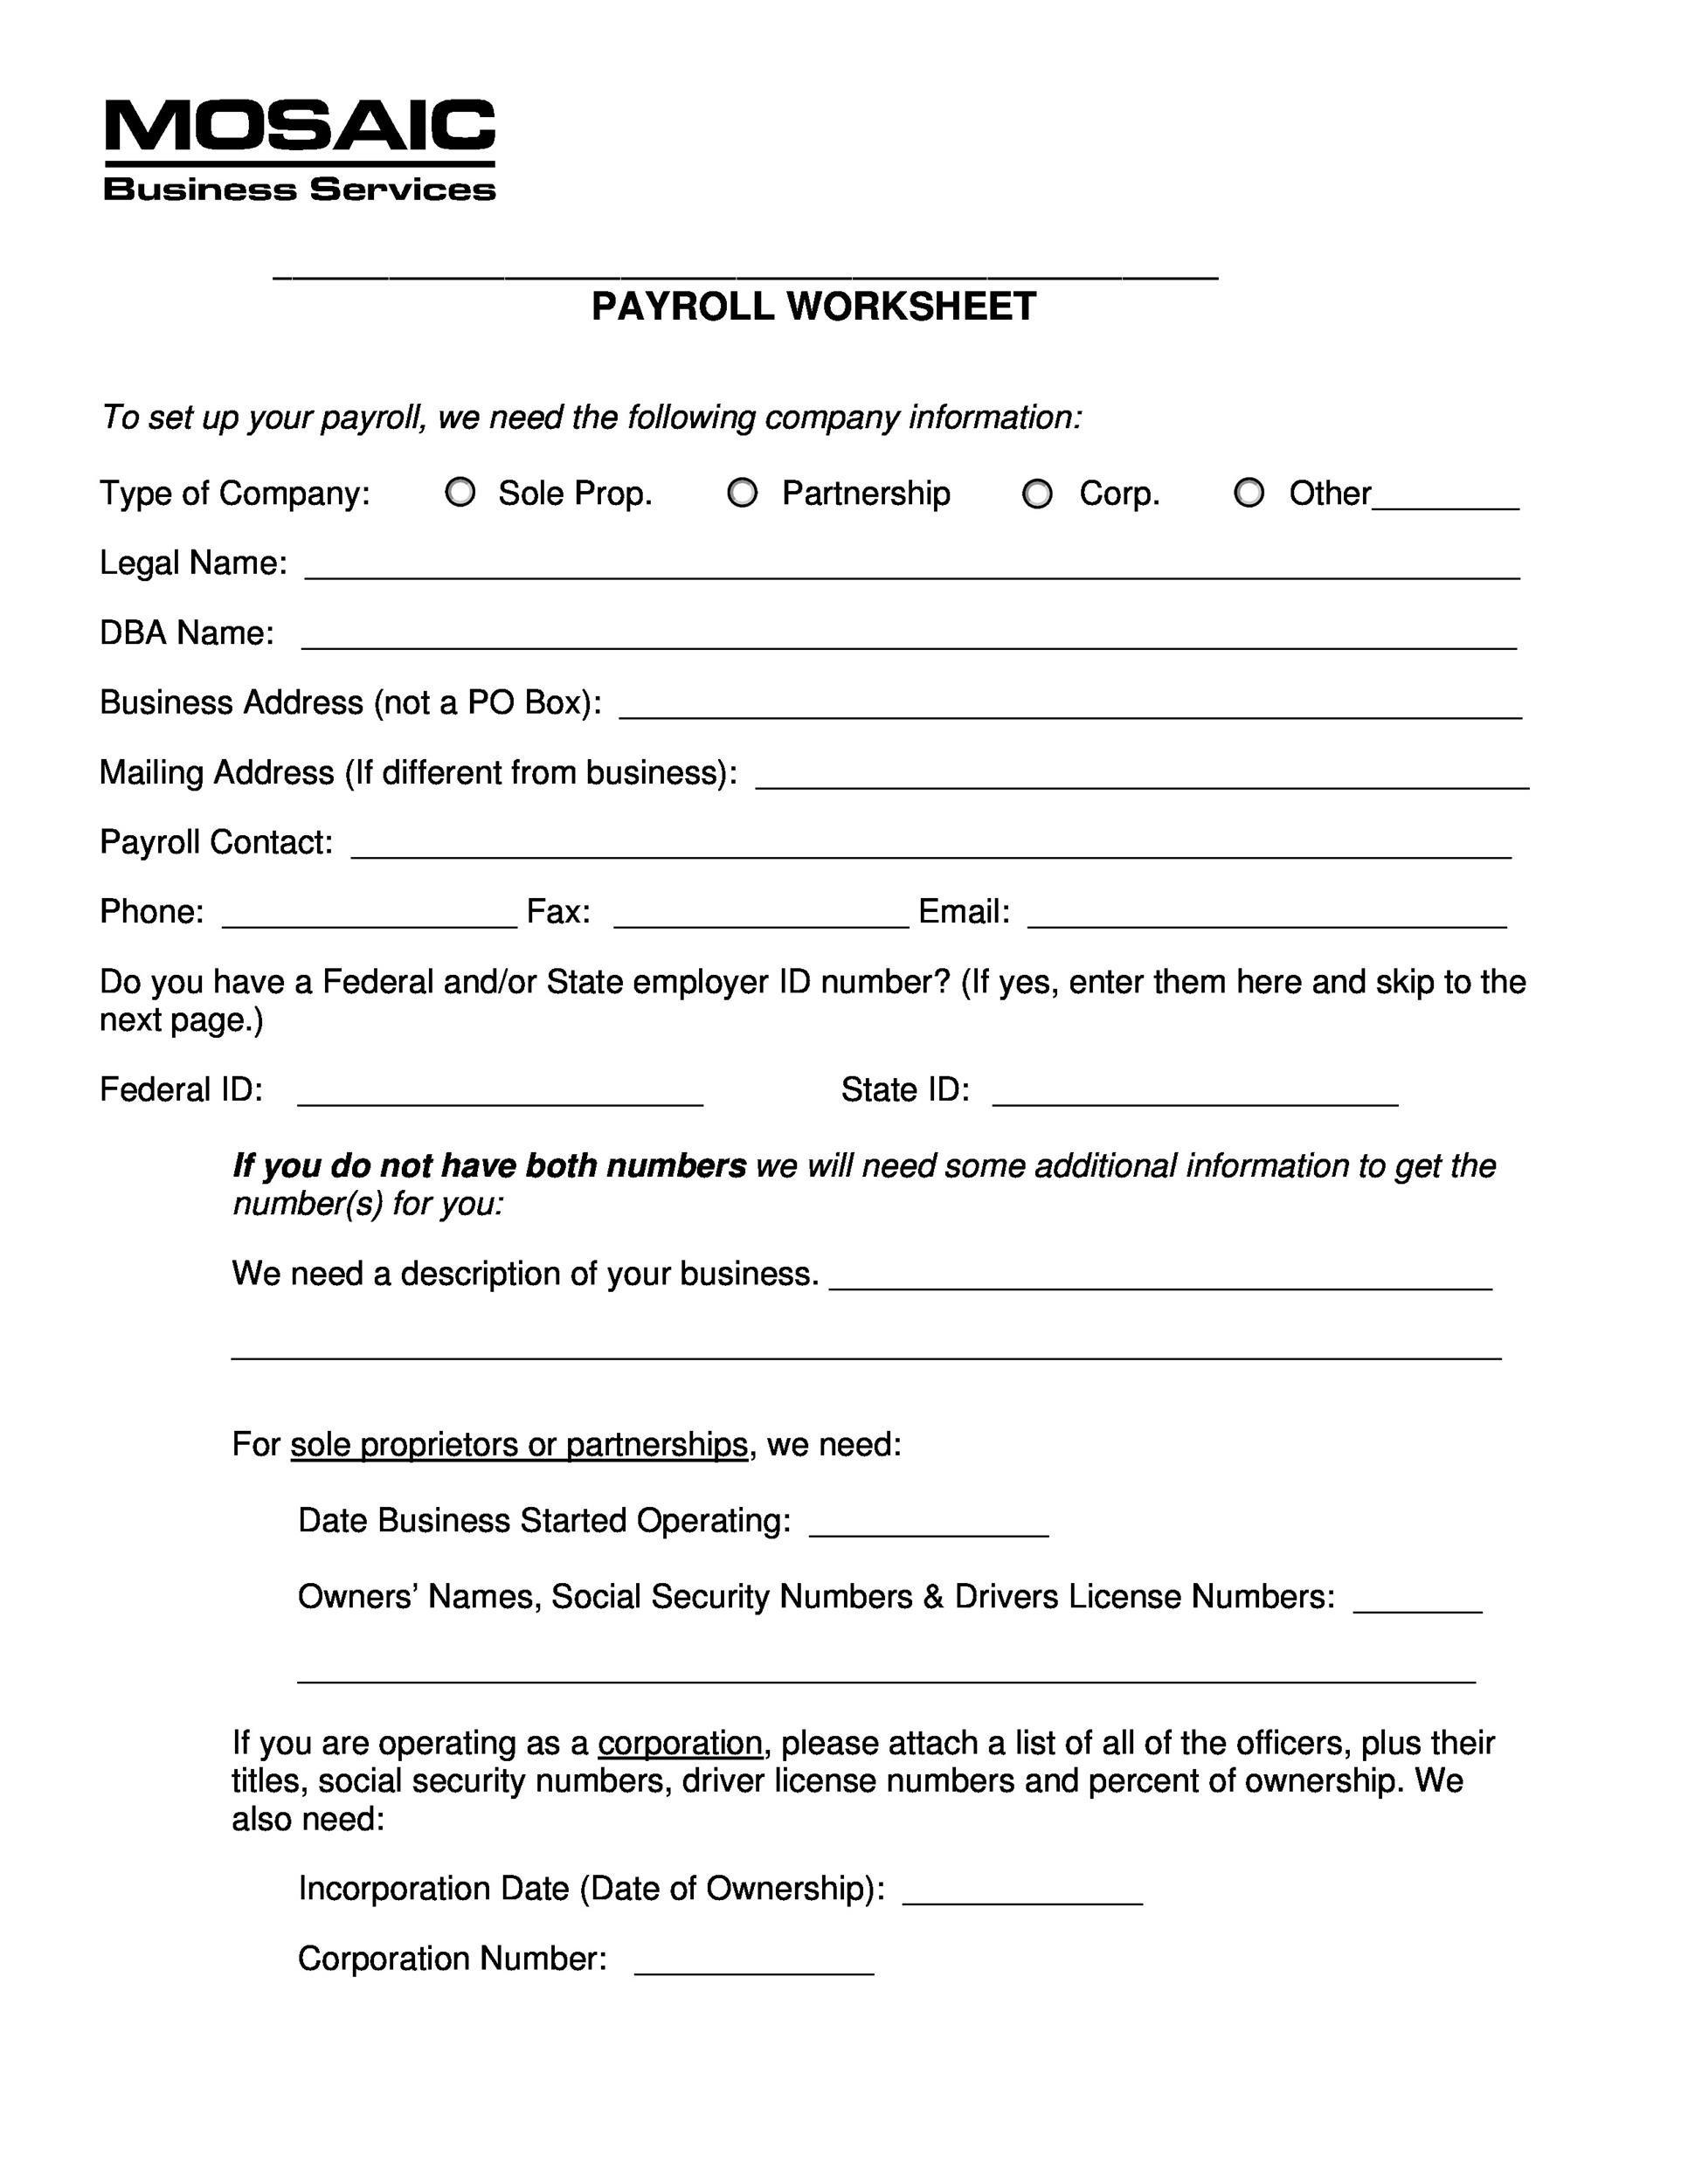 Free payroll template 21